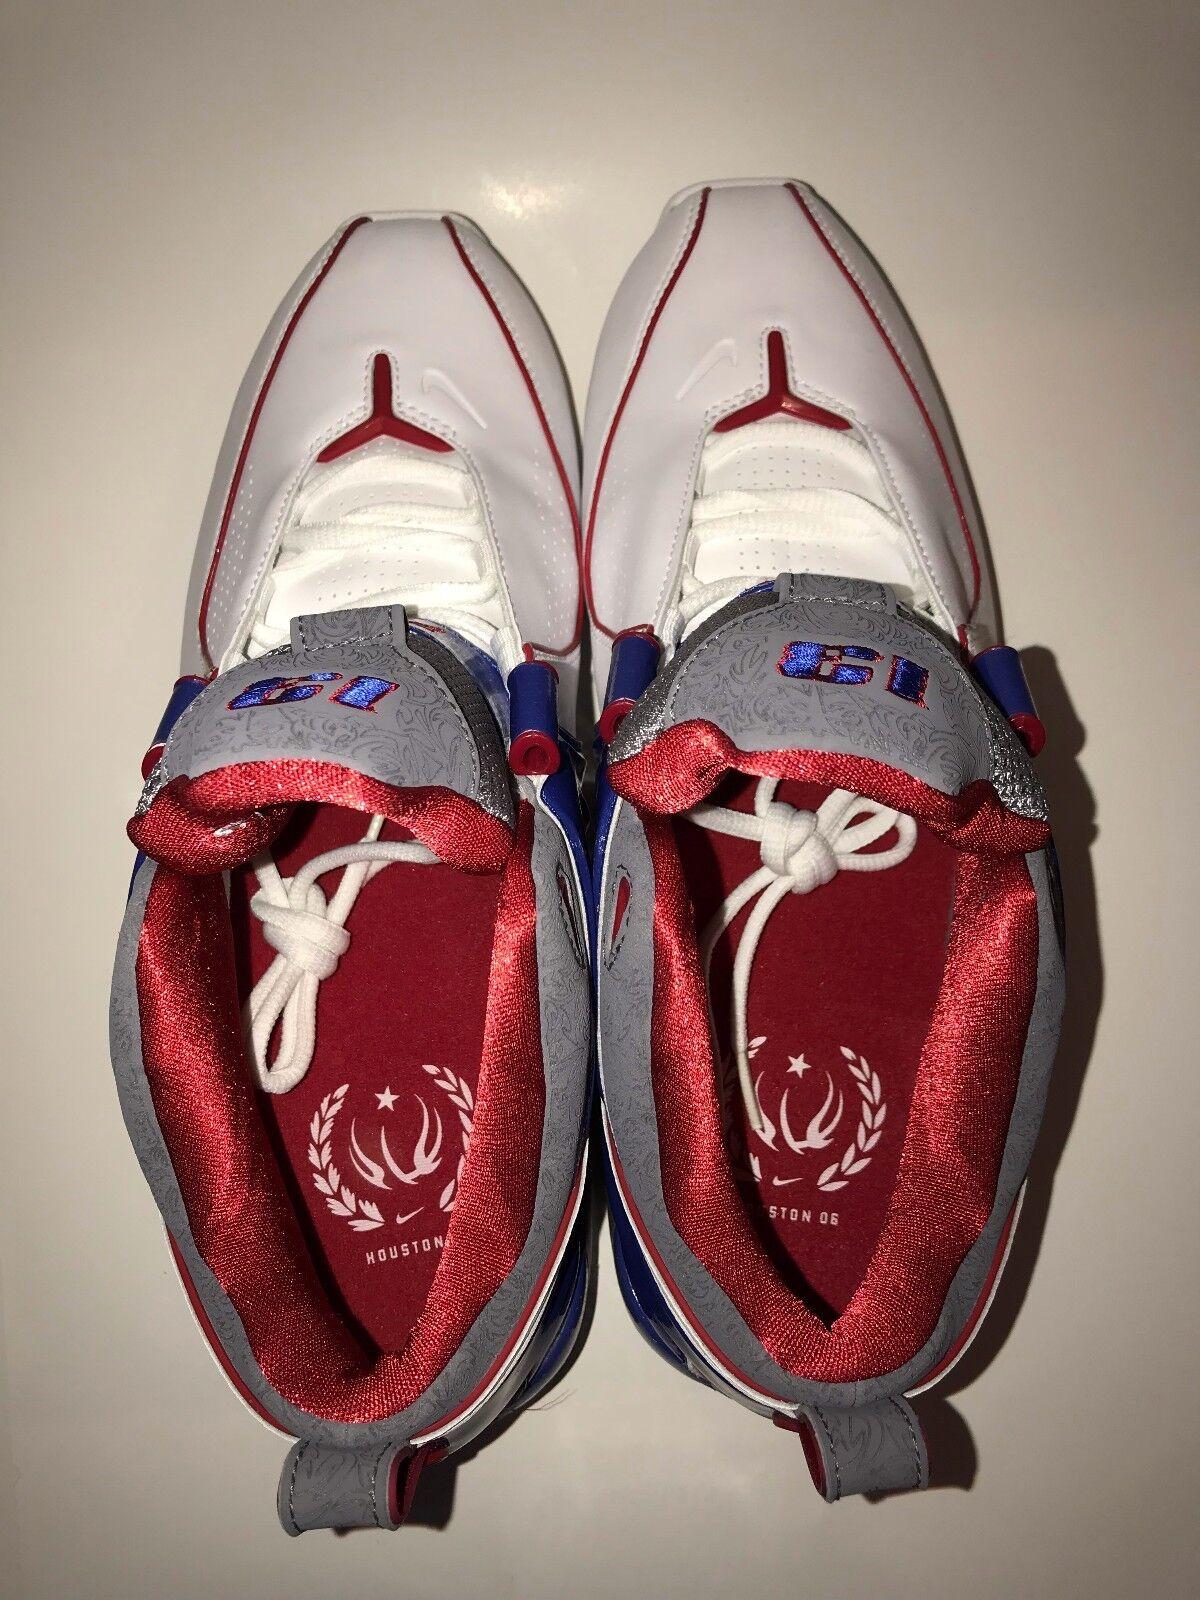 Nike air flug banger nash asg promo promo promo - stichprobe all - star - pe 11 bnib 100%. 4e7e1d